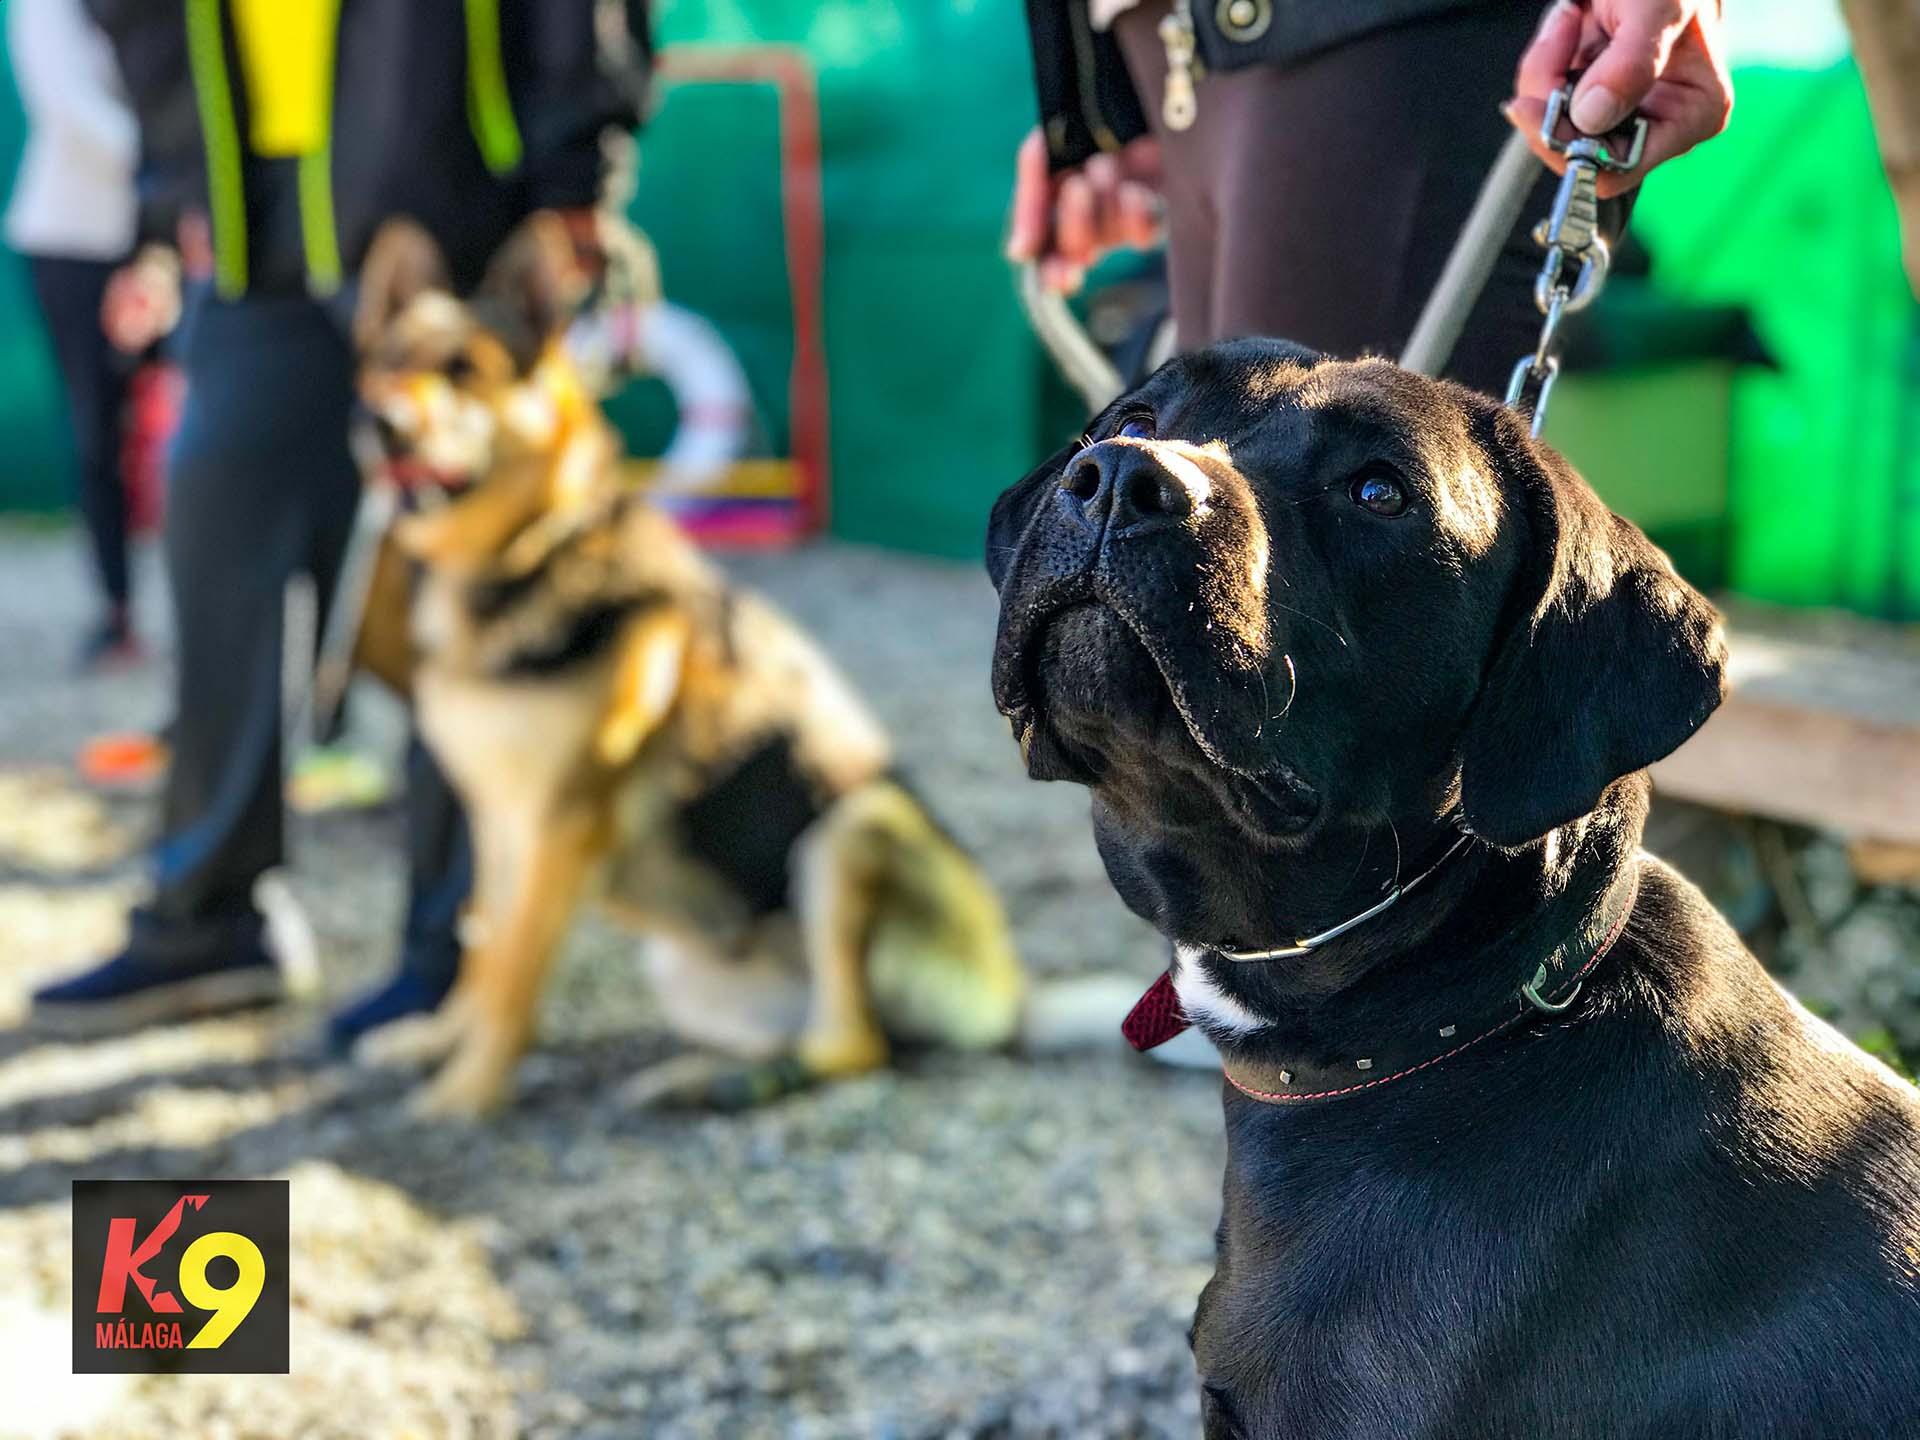 k9-malaga-clases-grupales-adiestramiento-canino